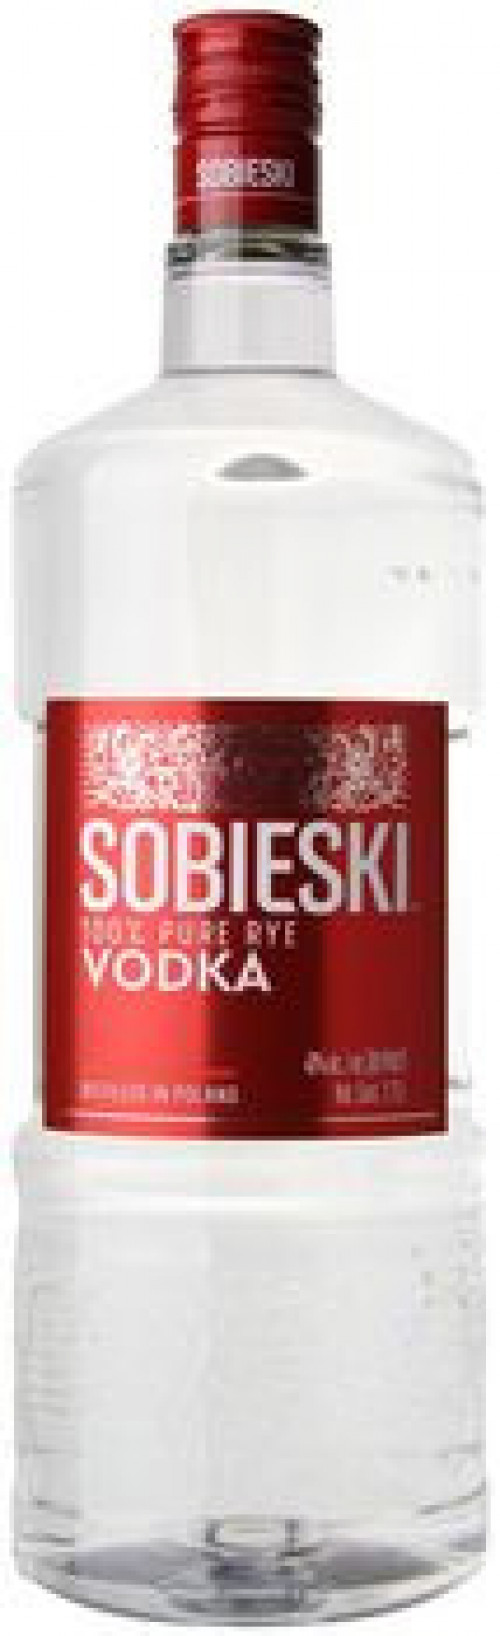 Sobieski Vodka 1.75 Ltr